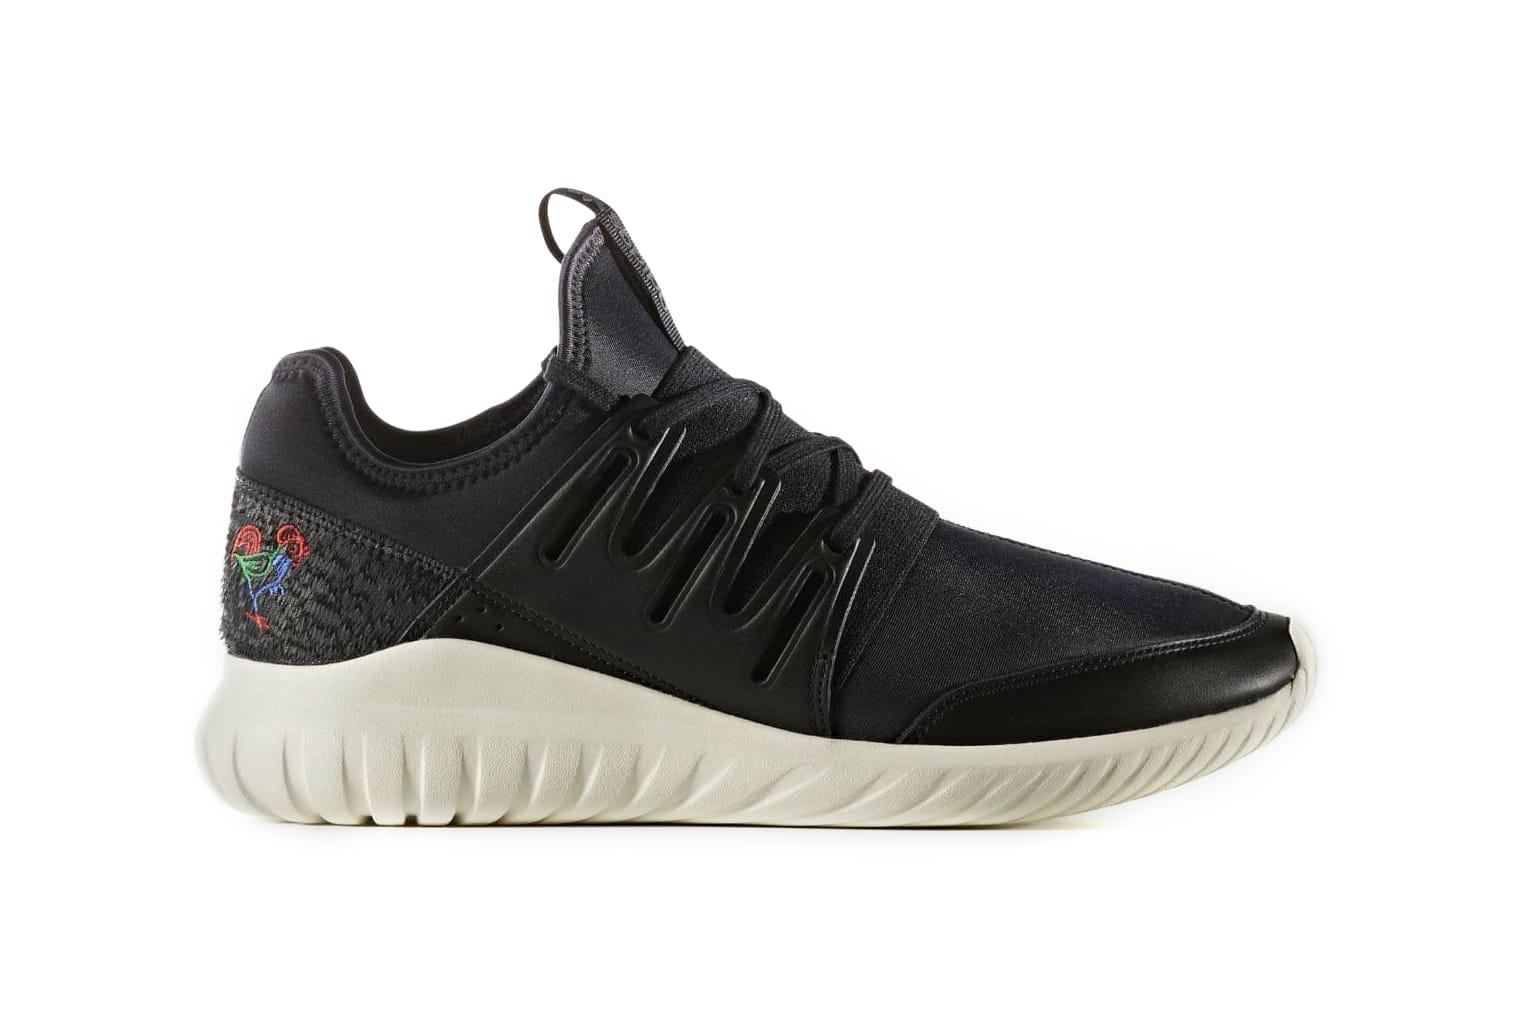 adidas Tubular Radial CNY Edition | HYPEBEAST